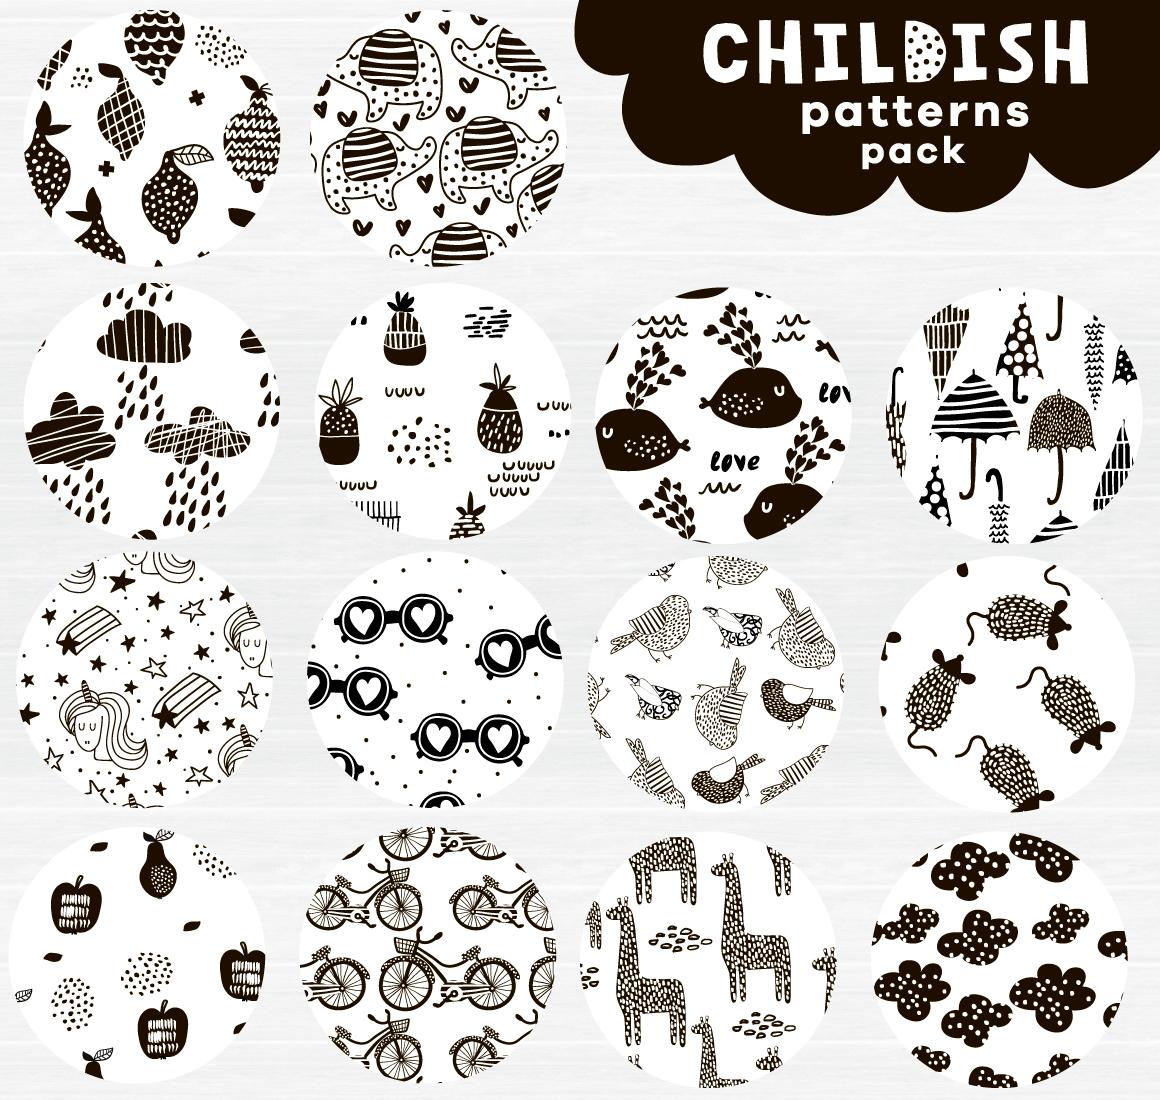 Childish patterns pack example image 4